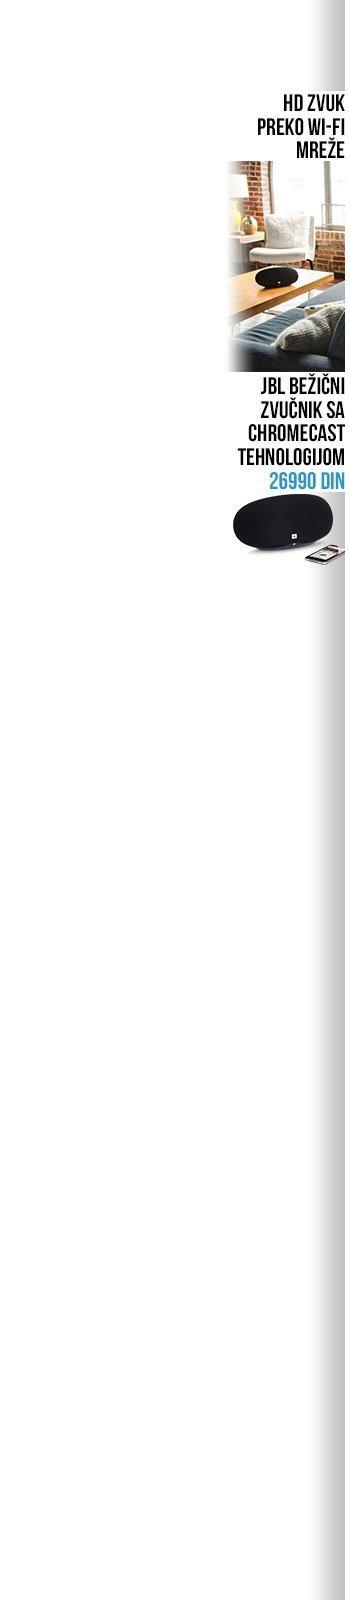 JBL Playlist 150 bežični zvučnik